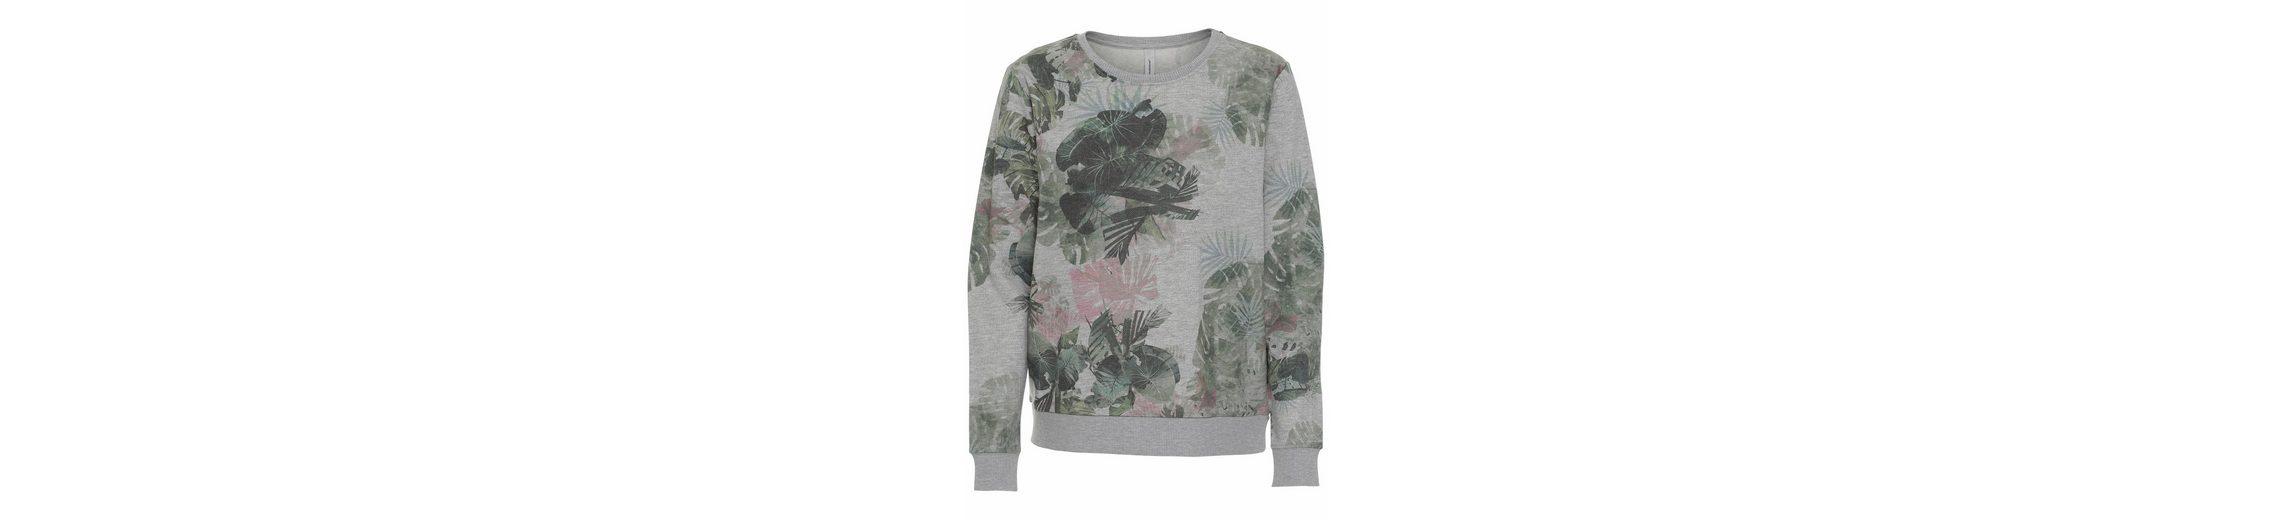 soyaconcept Sweatshirt Osha 4, mit Blätterprint